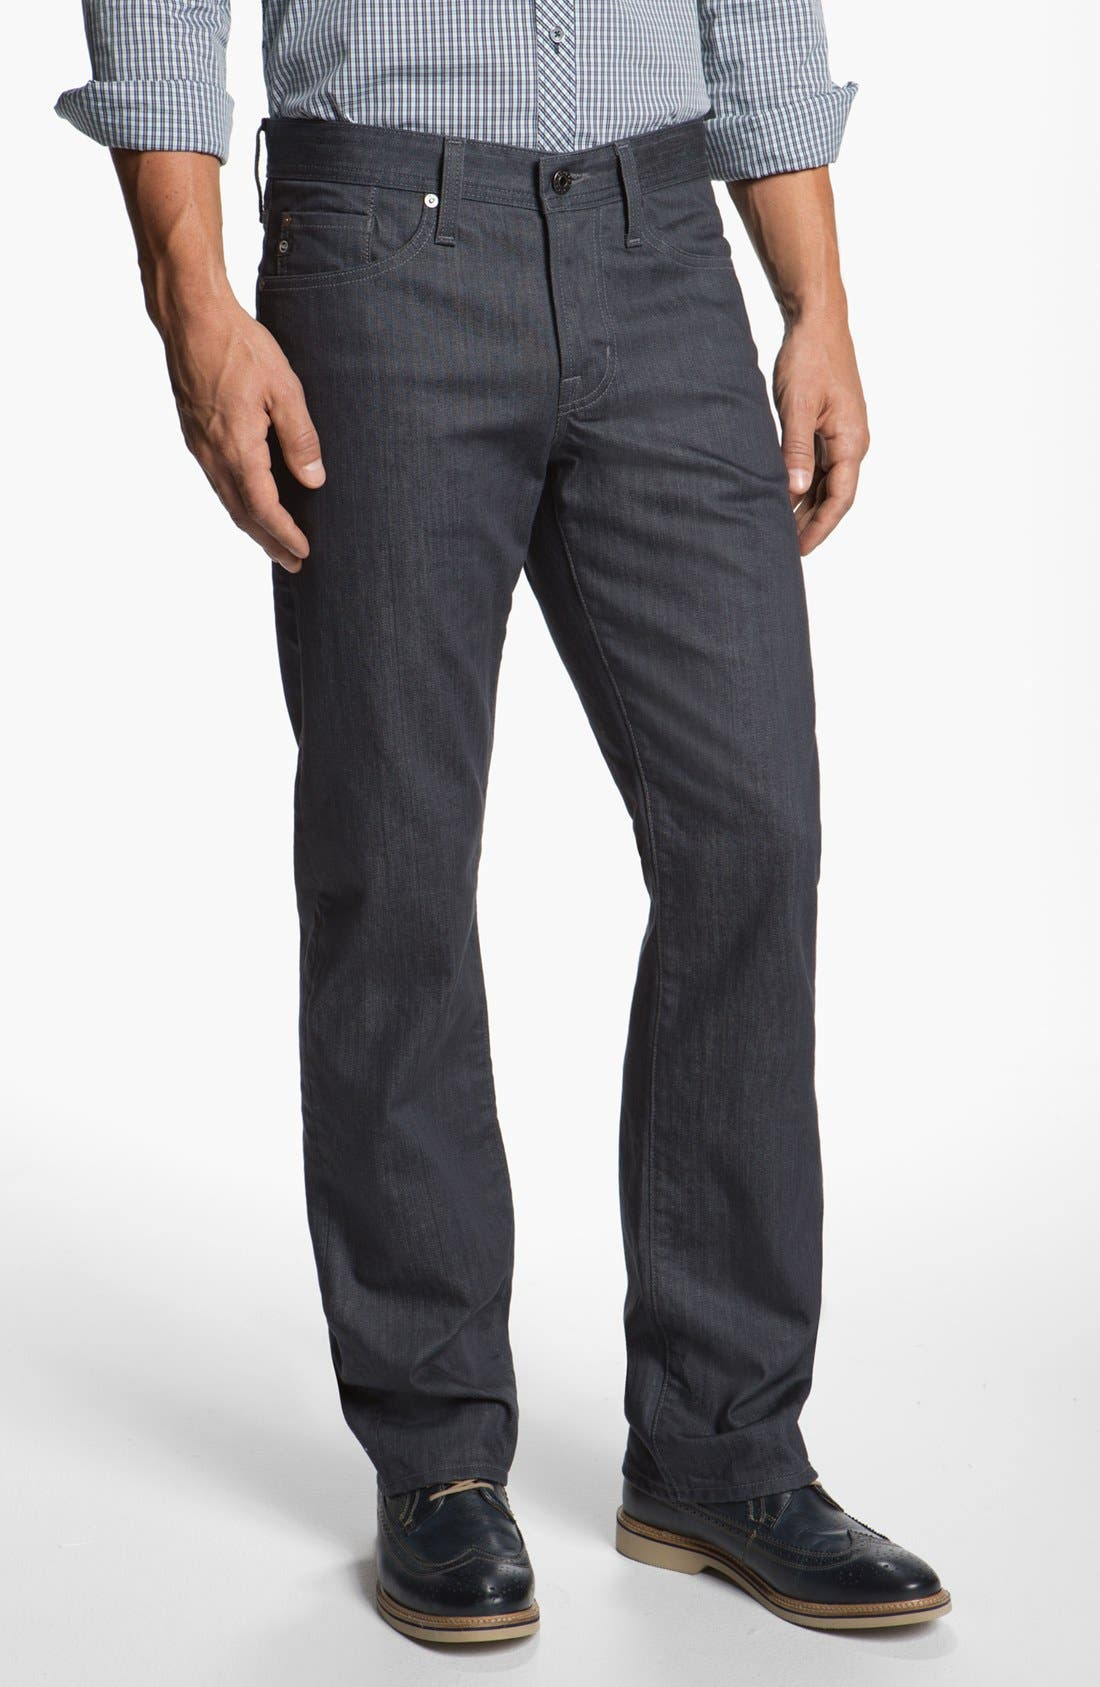 Alternate Image 1 Selected - AG 'Protégé' Straight Leg Jeans (Airlift)